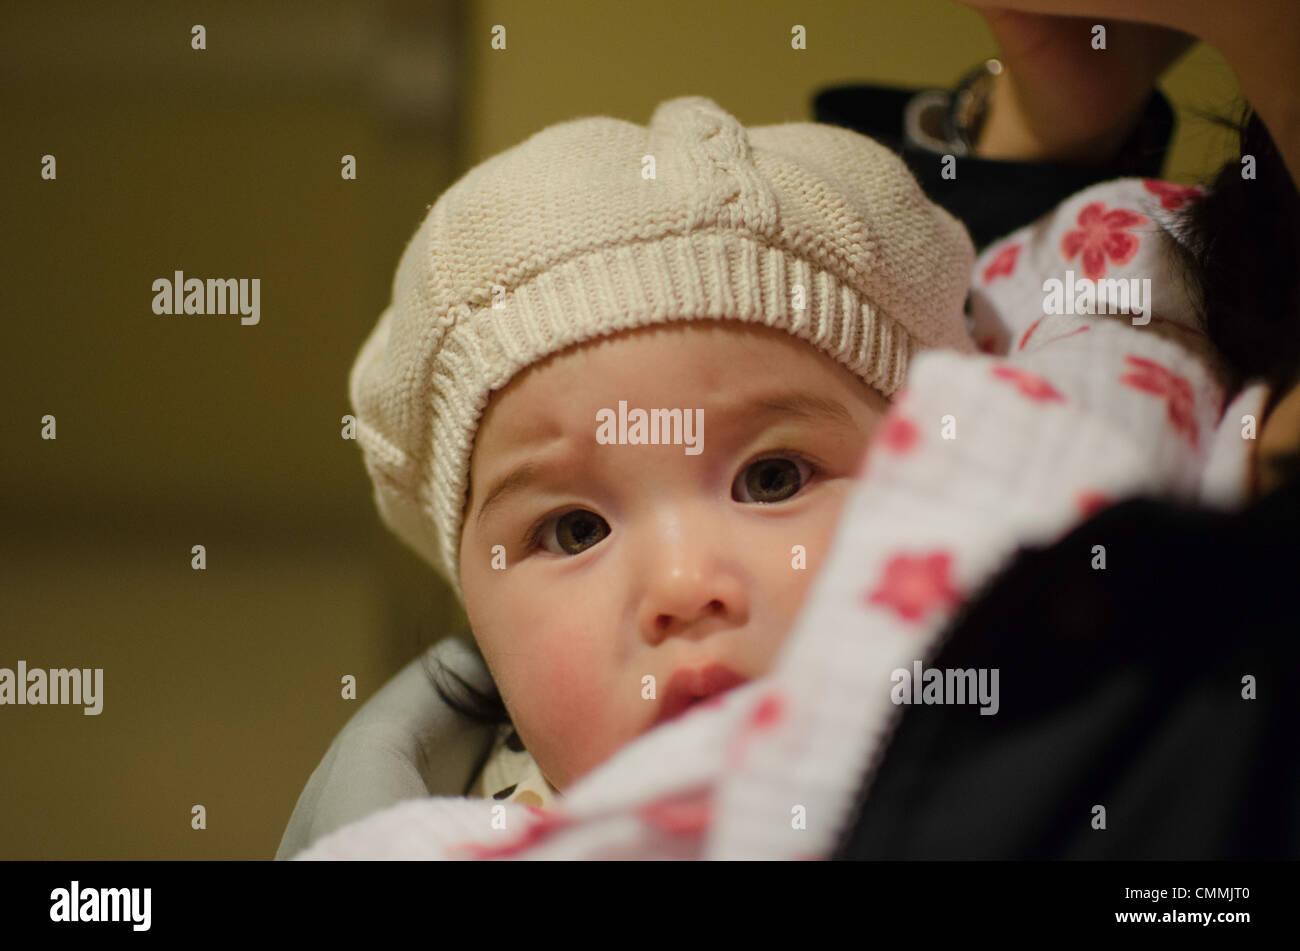 cute mixed asian (korean) caucasian baby girl looks at the